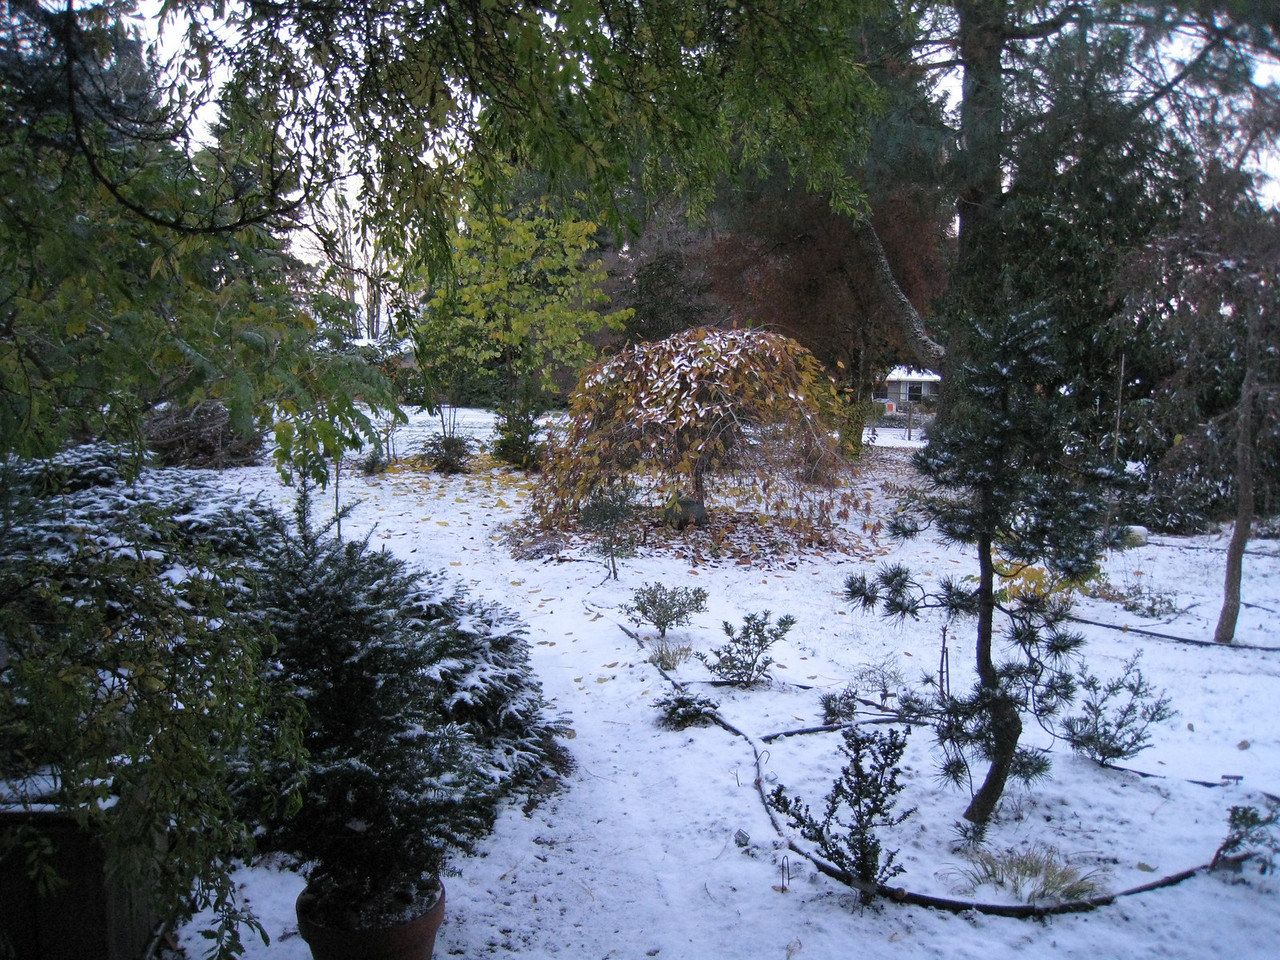 A snowy & cold November 23rd!